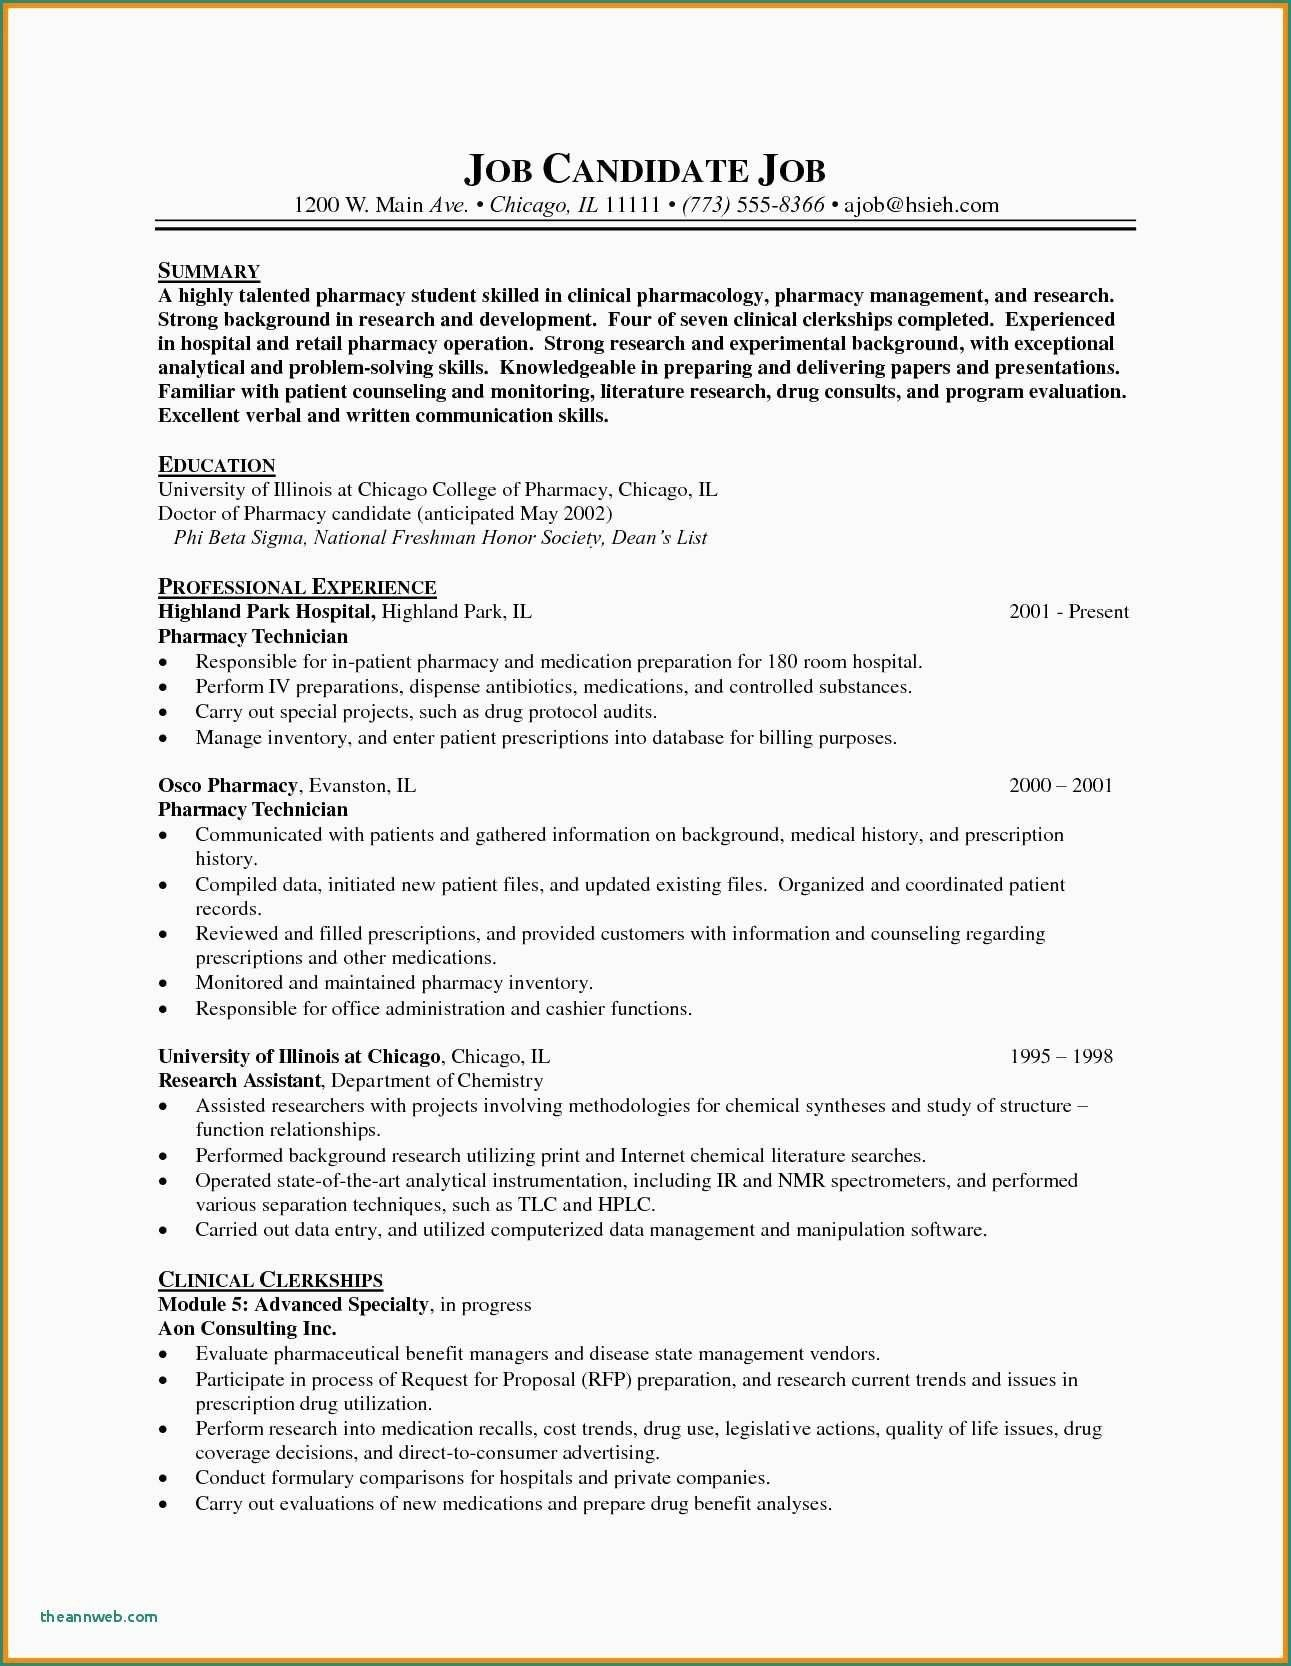 Software Development Manager Resume Best Of Property Manager Resume Example New Resume Examples Prope Resume Skills Pharmacy Technician Cover Letter For Resume